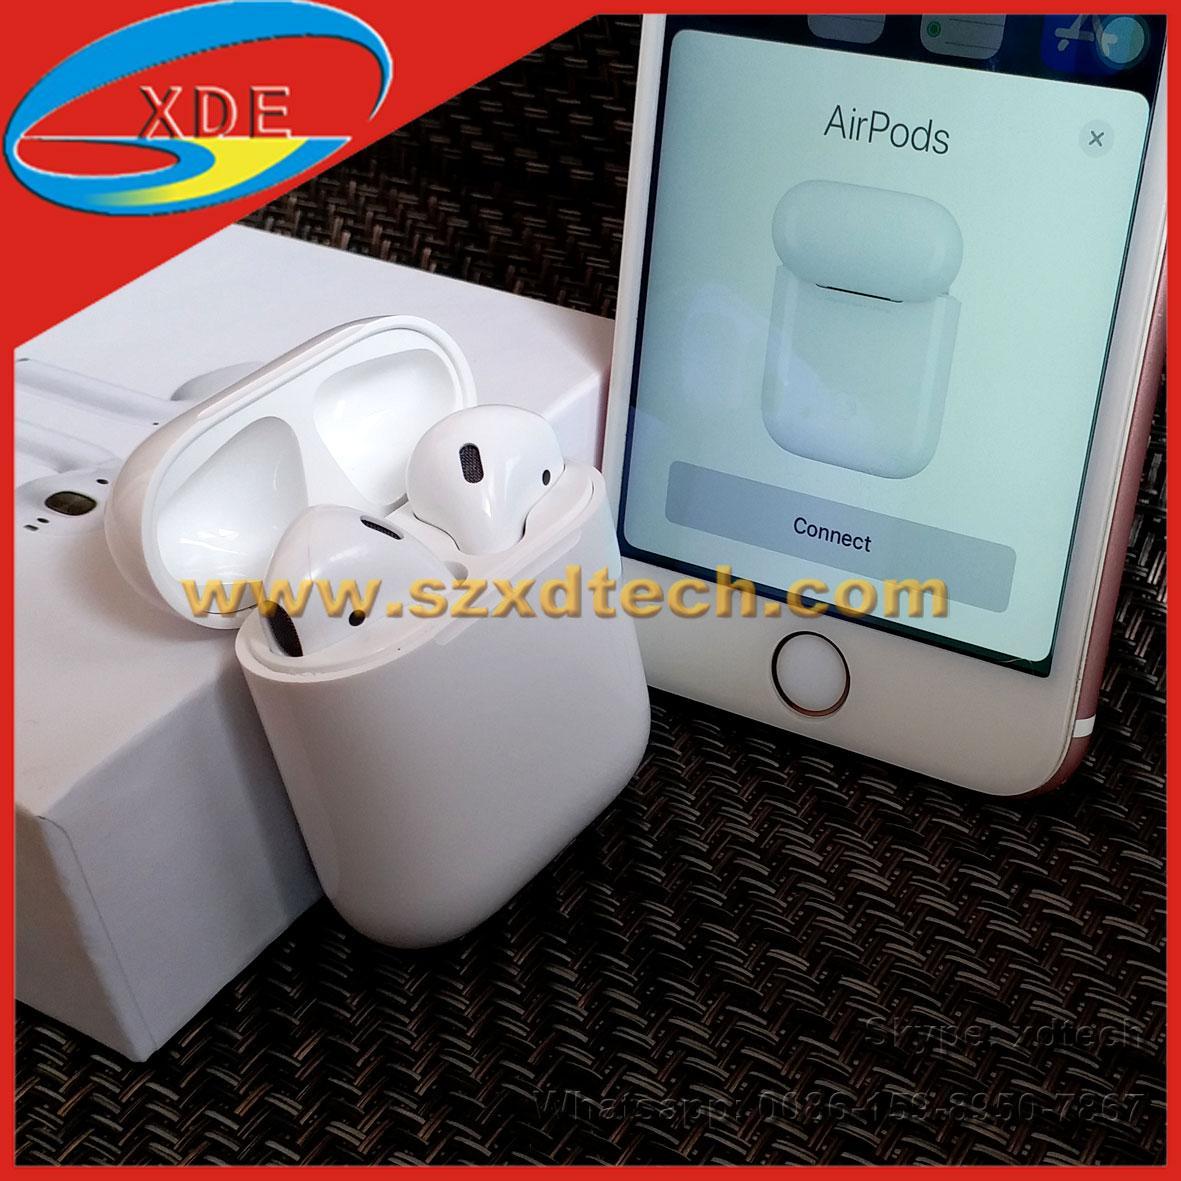 866362e7149 Best Quality Apple Airpod Clone 1:1 Quality as Original 1:1 Size 1 ...